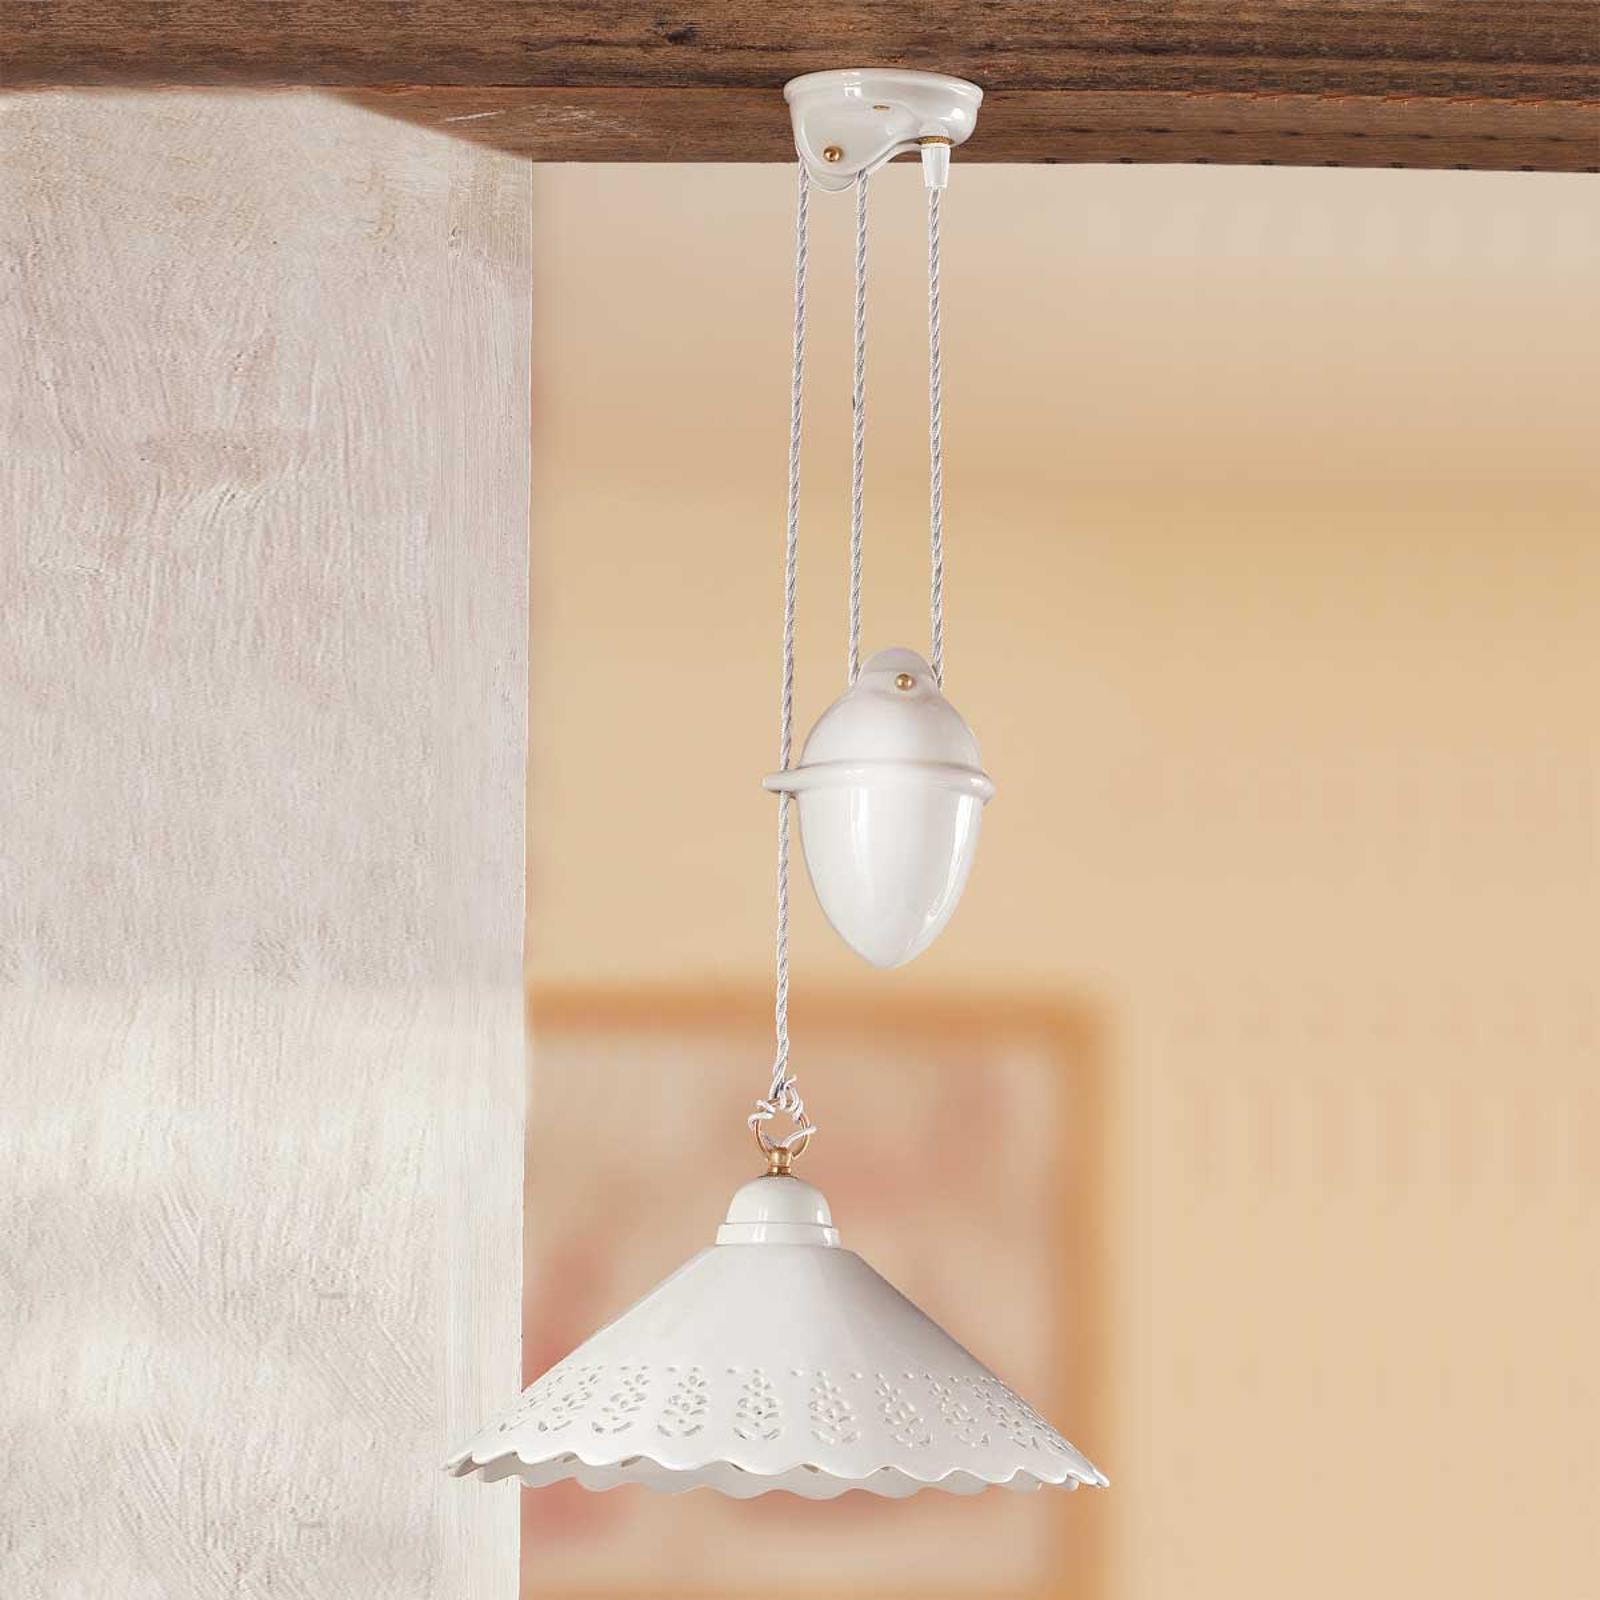 Hanglamp Pizzo met koord, 1-lamps, 40 cm